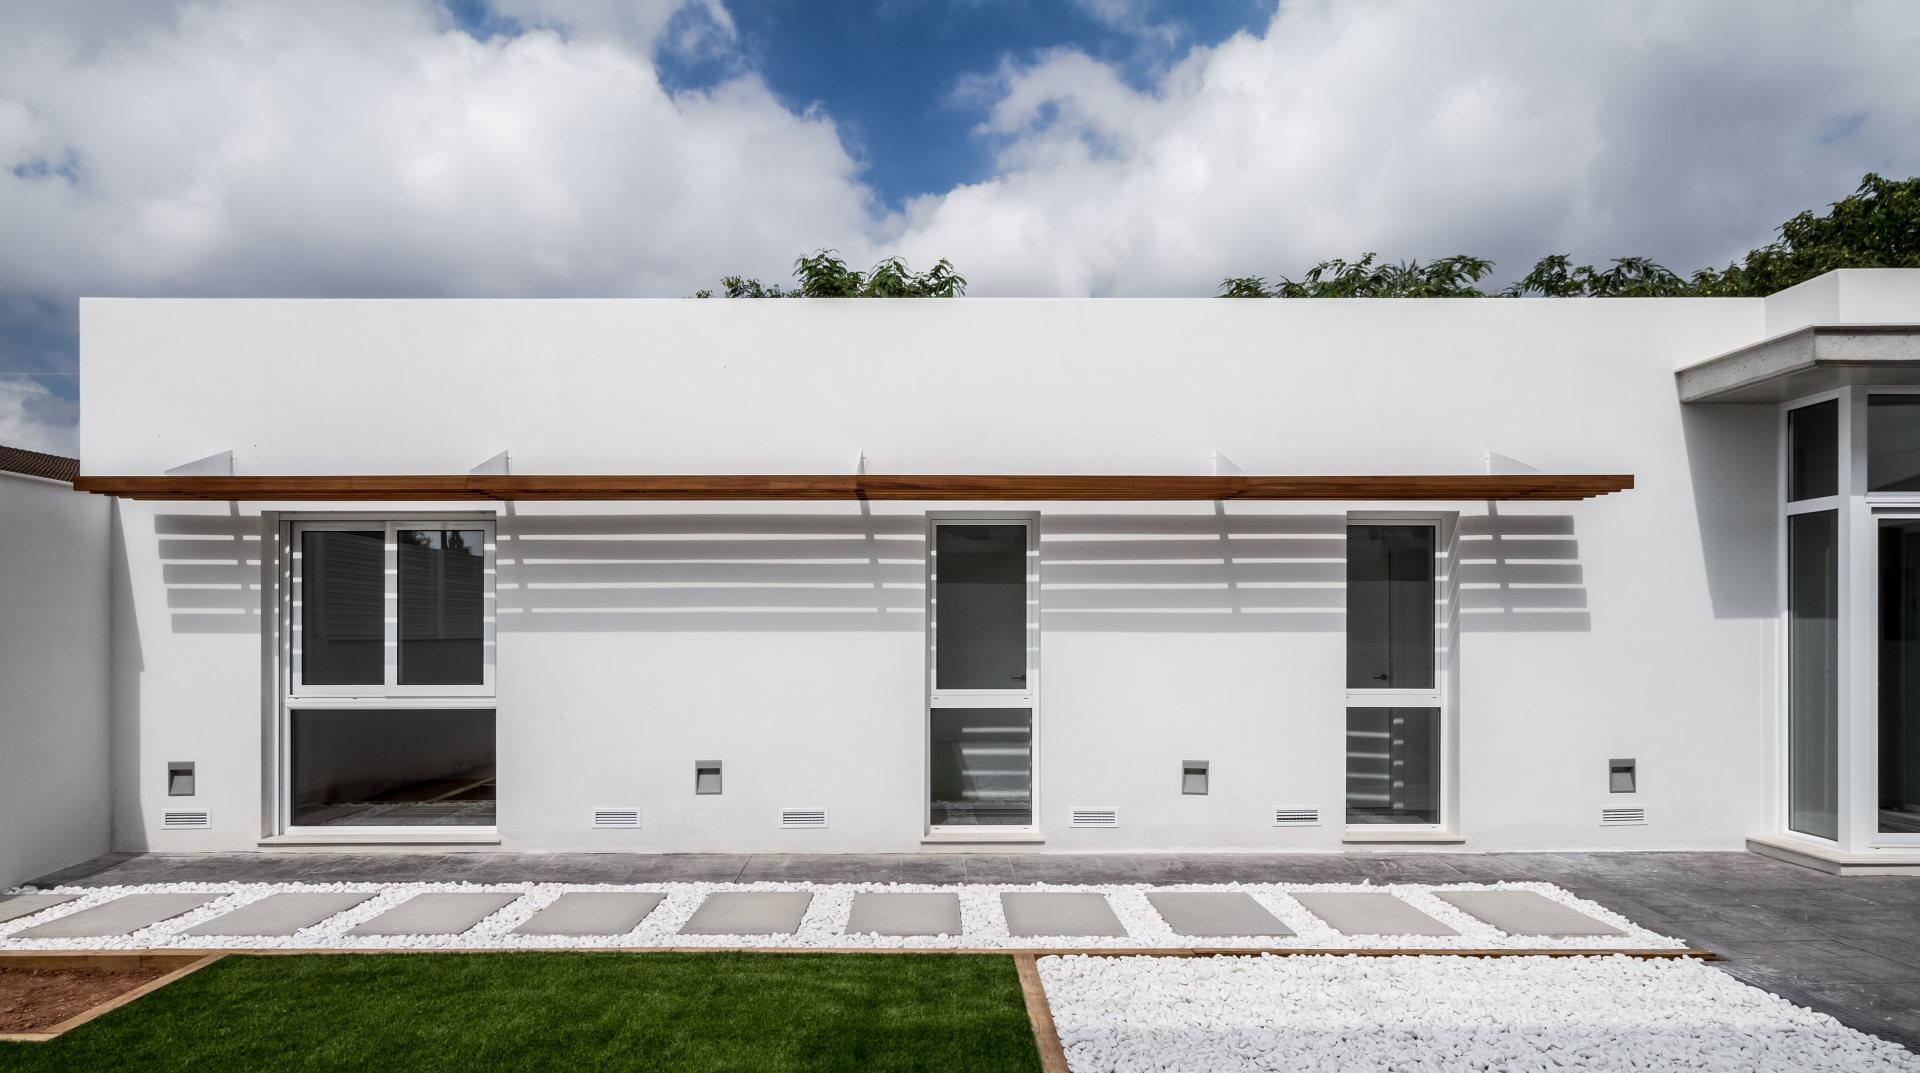 fotografia-arquitectura-valencia-german-cabo-viraje-museros (19)